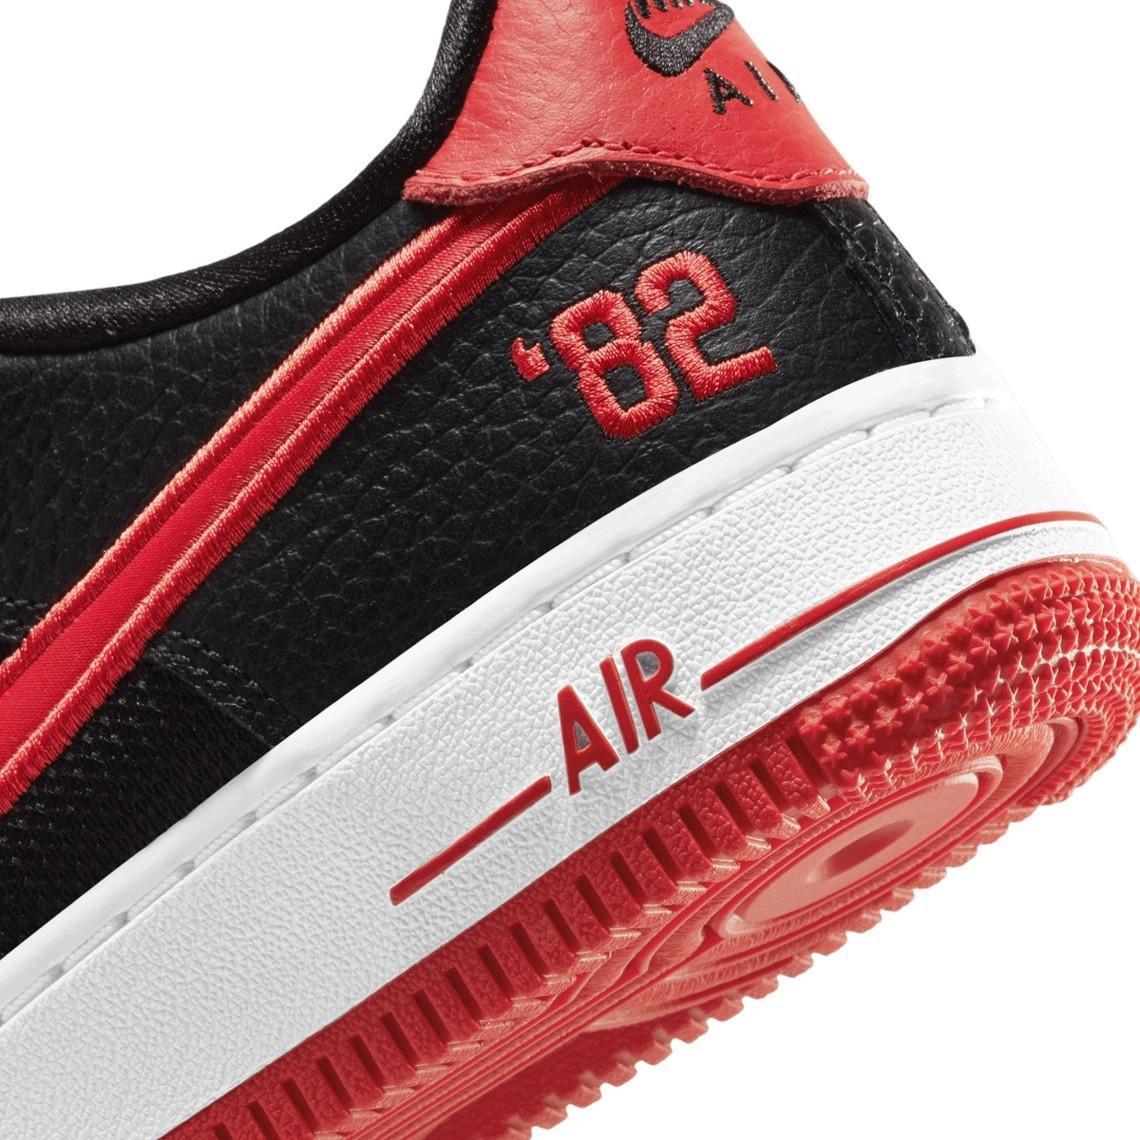 Nike Air Force 1 Low 82 Bred et Royal